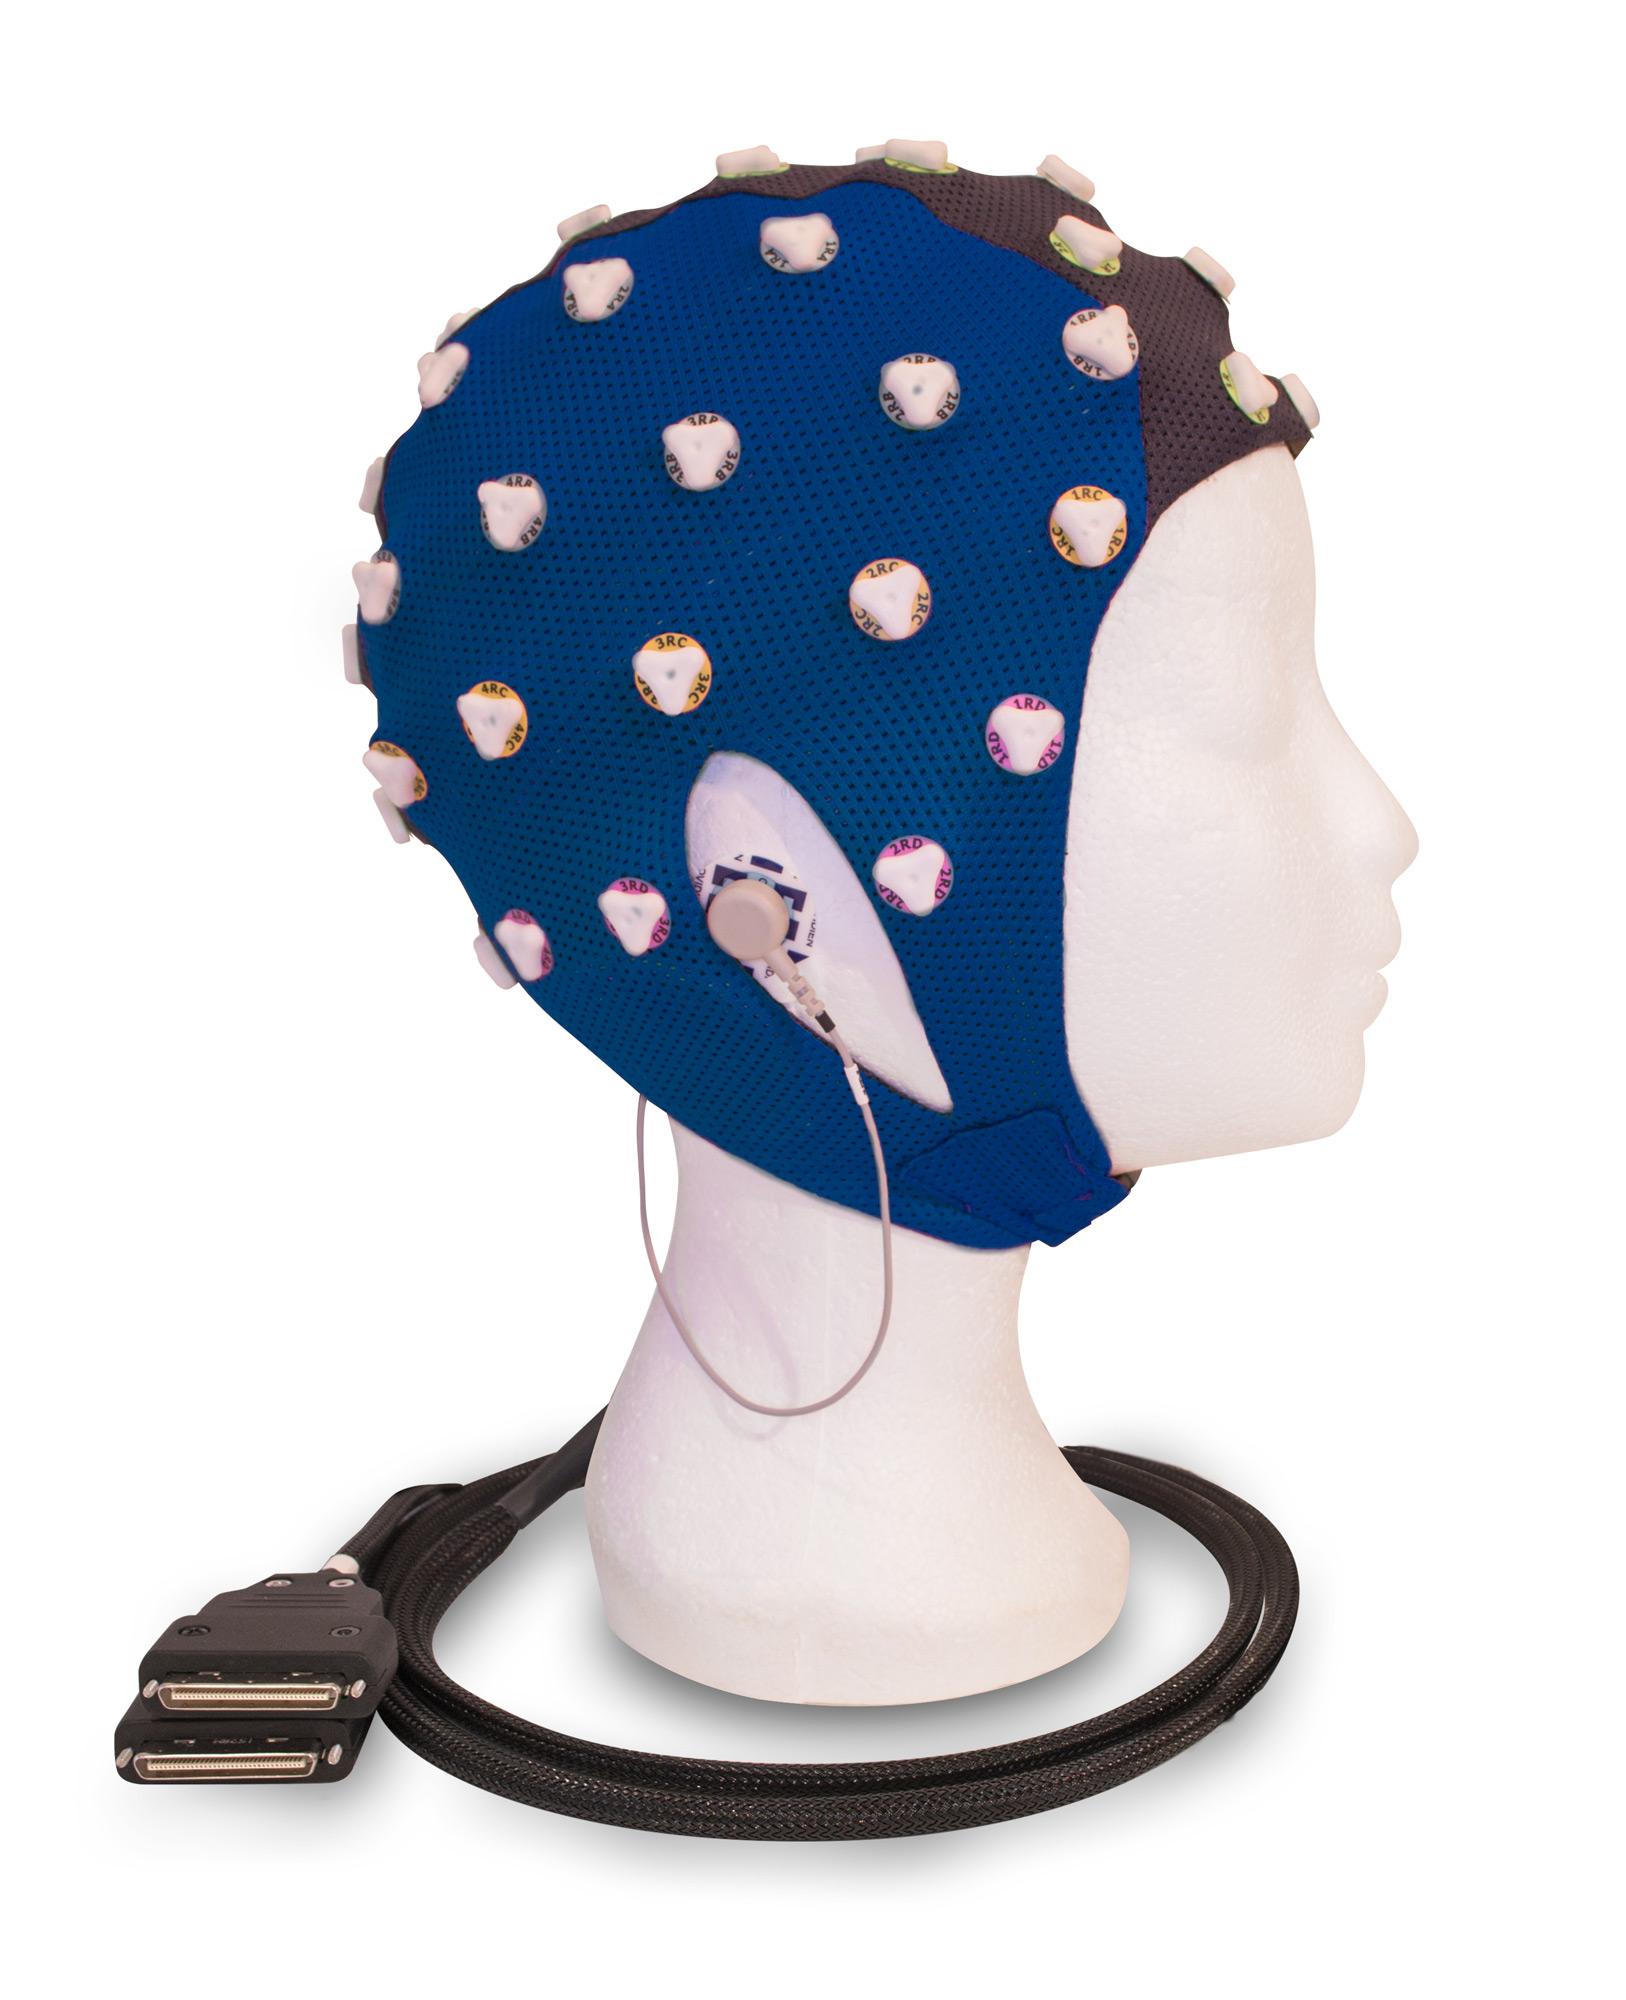 dry electrode EEG cap, dry-electrode EEG cap